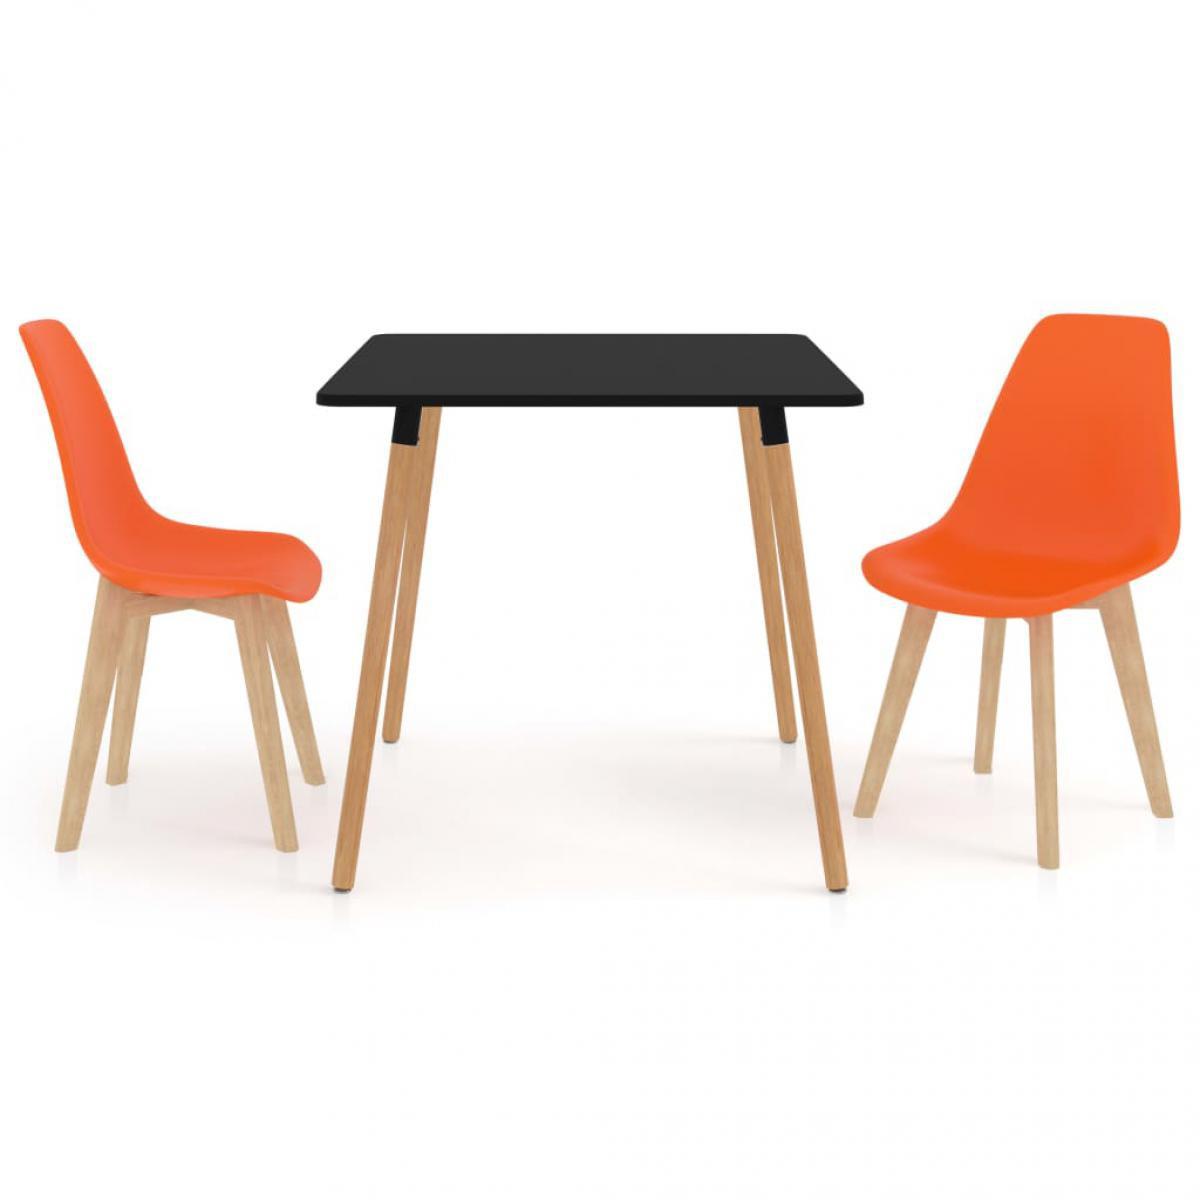 Vidaxl vidaXL Ensemble de salle à manger 3 pcs Orange